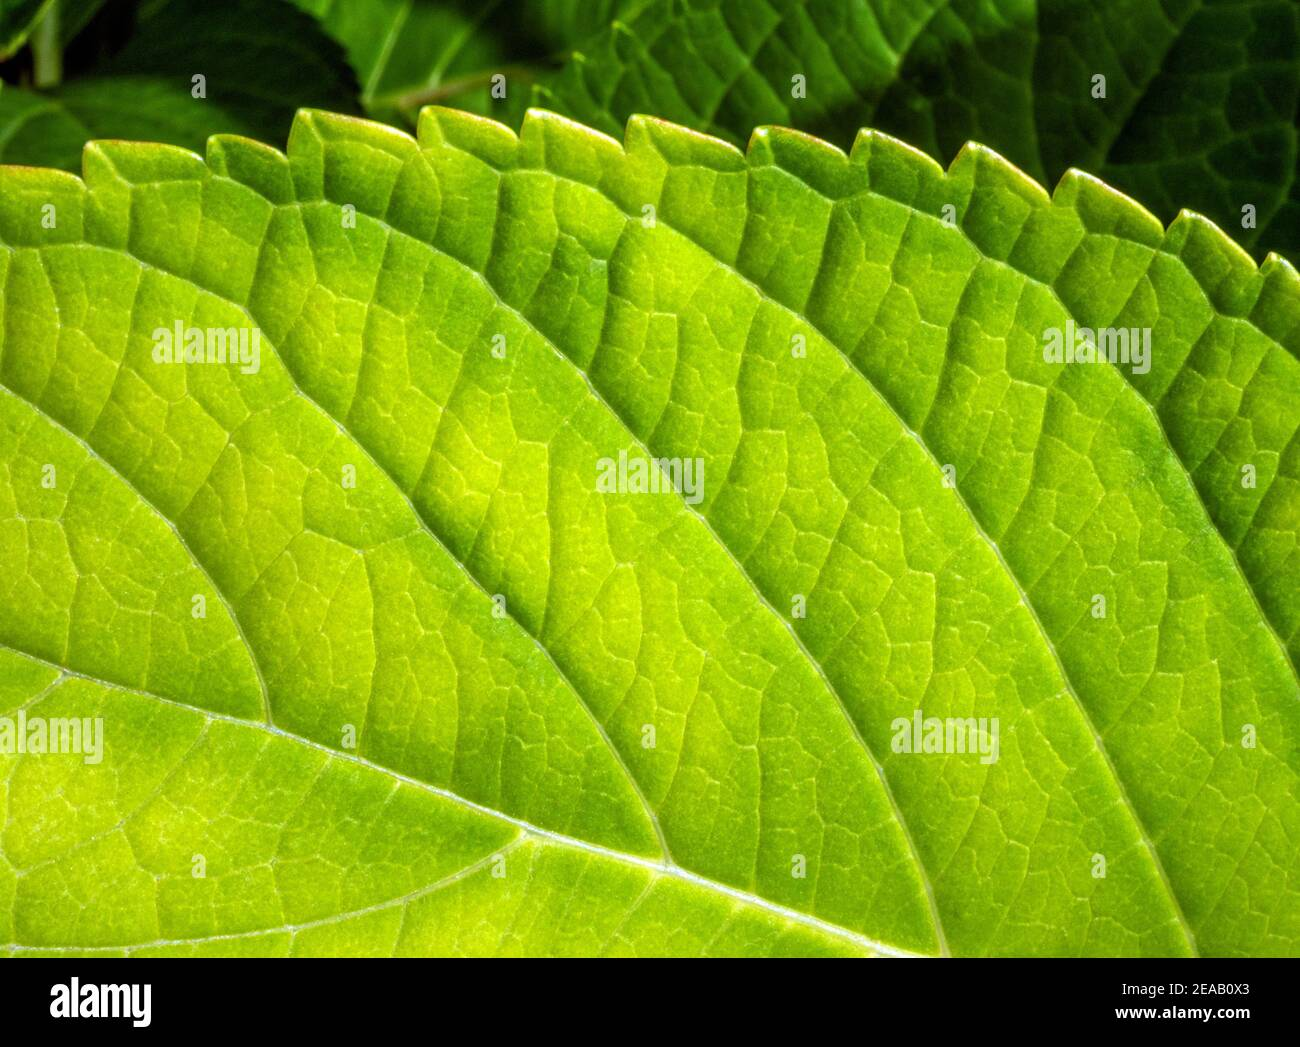 Leaf of a garden hydrangea (Hydrangea macrophylla), close-up, Bavaria, Germany, Europe Stock Photo